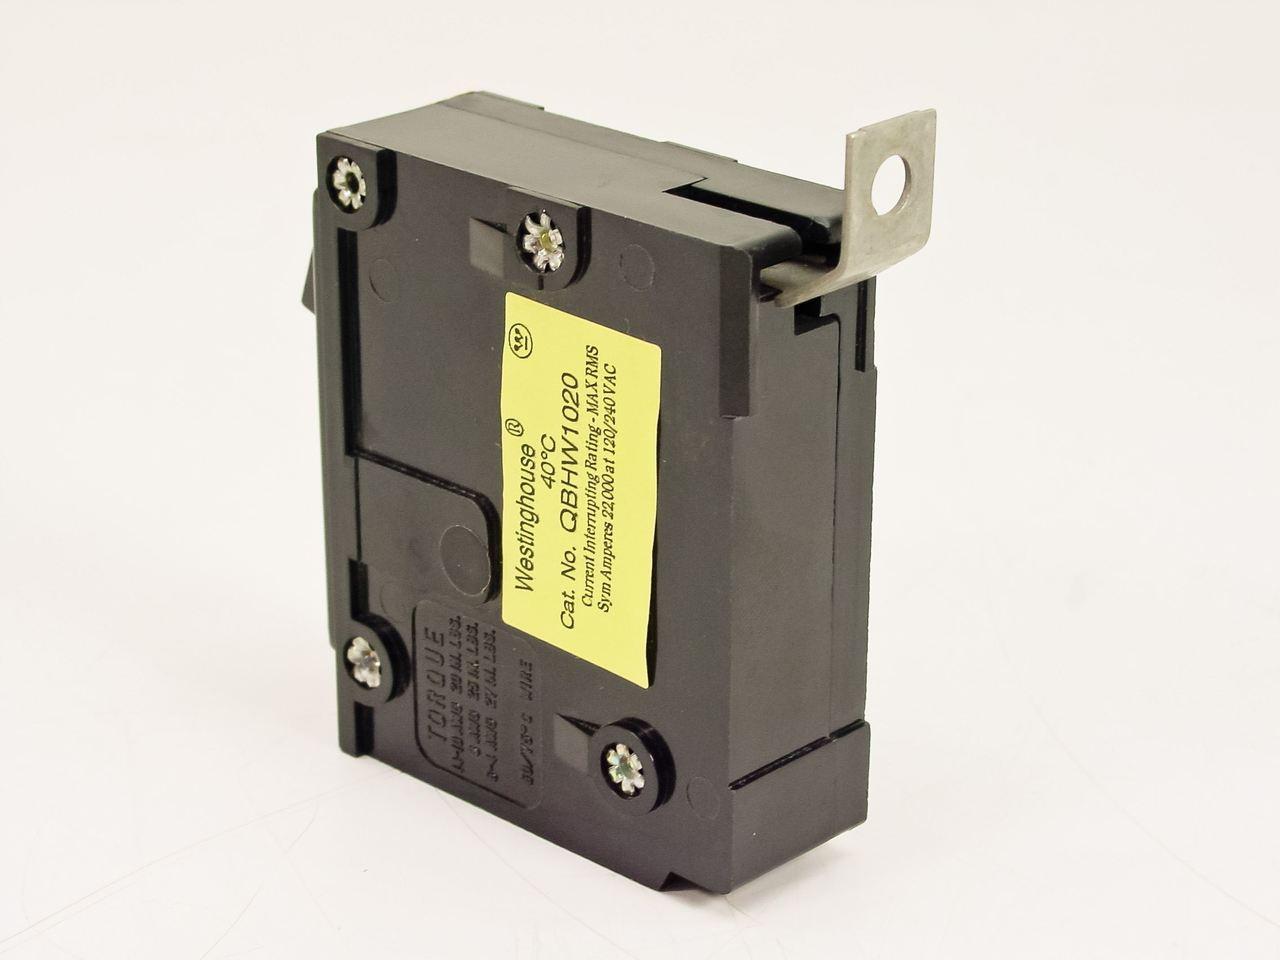 westinghouse 20amp circuit breaker qbhw1020 westinghouse 20amp circuit breaker qbhw1020  [ 1280 x 960 Pixel ]